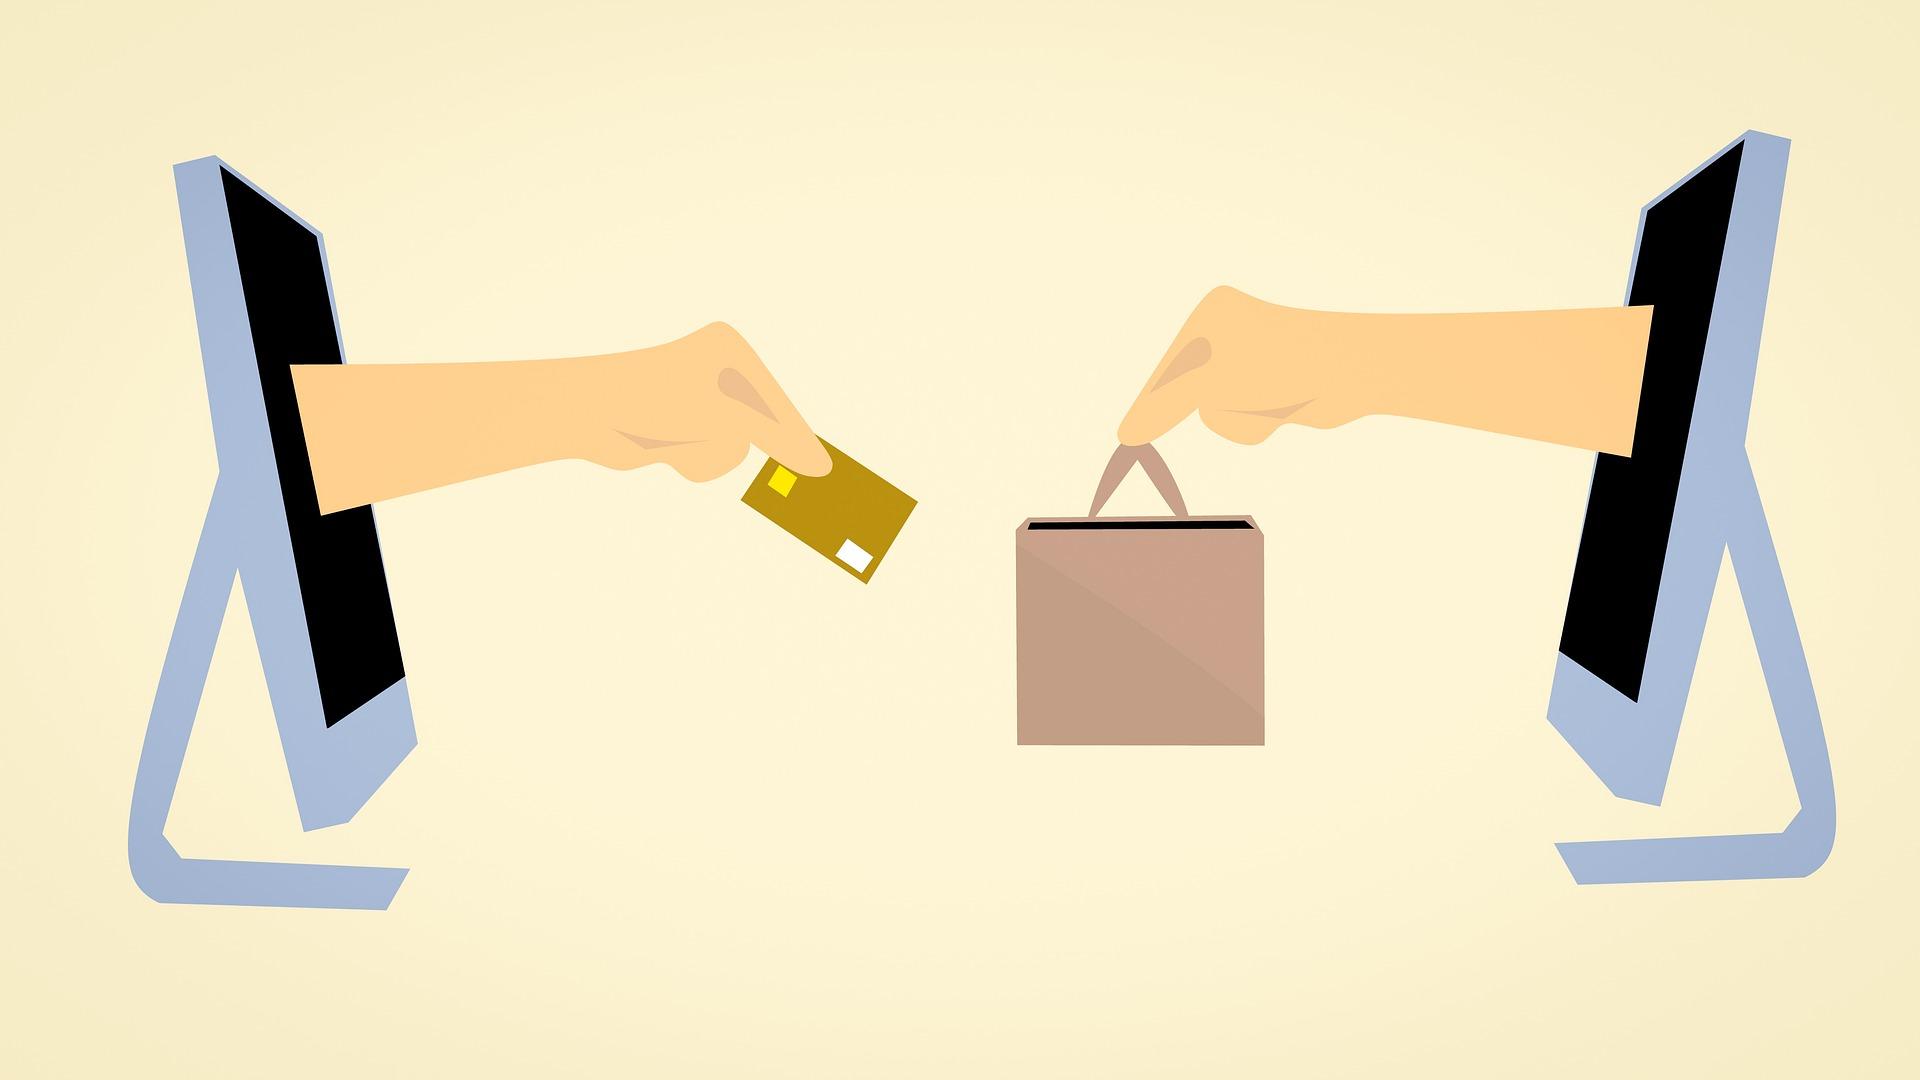 Je rechten betreft online shoppen. Herroepingsrecht.